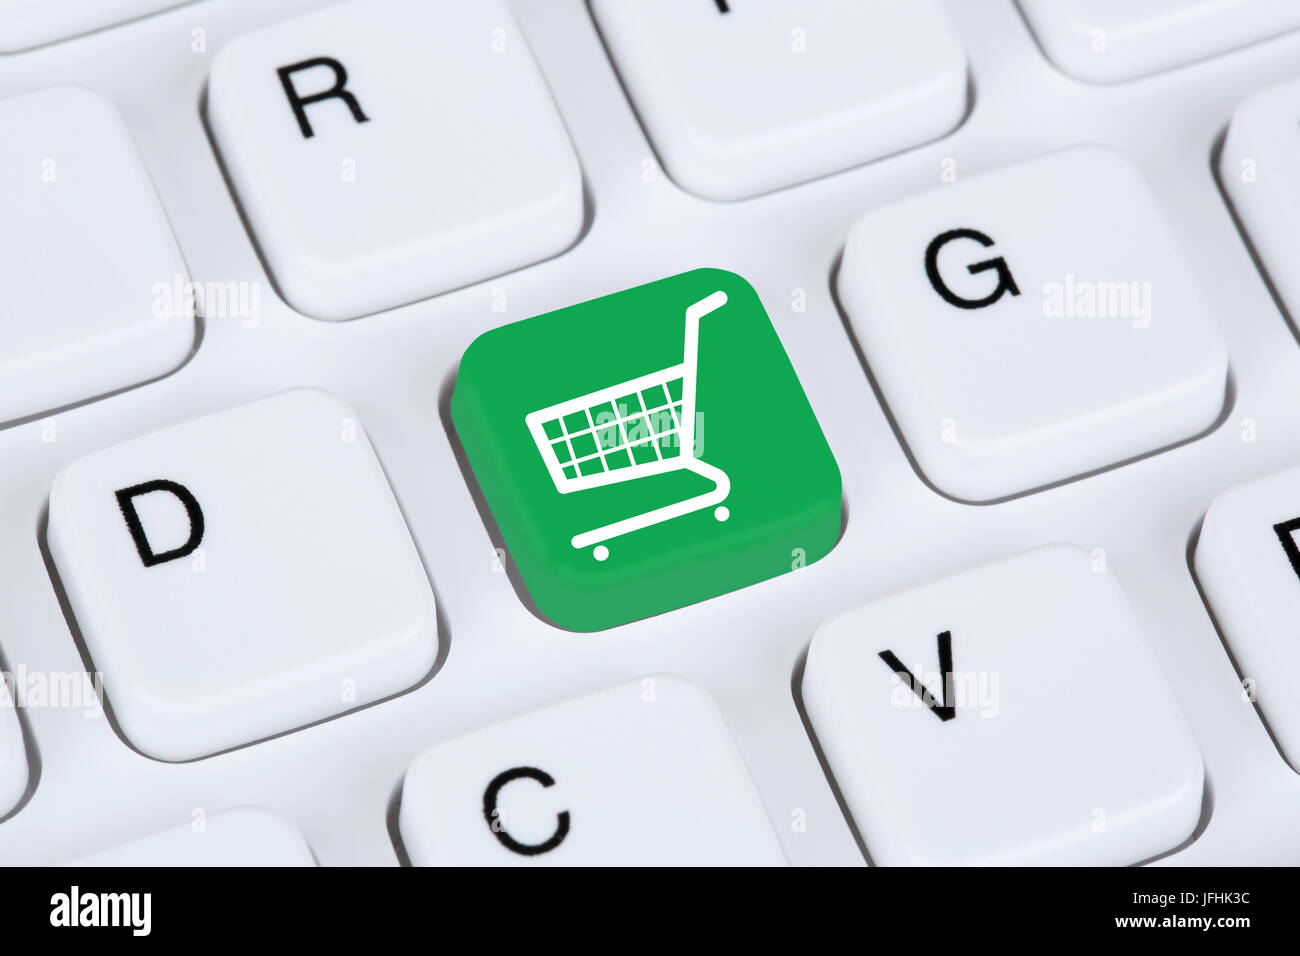 Online Shopping E-Commerce einkaufen im Internet - Stock Image